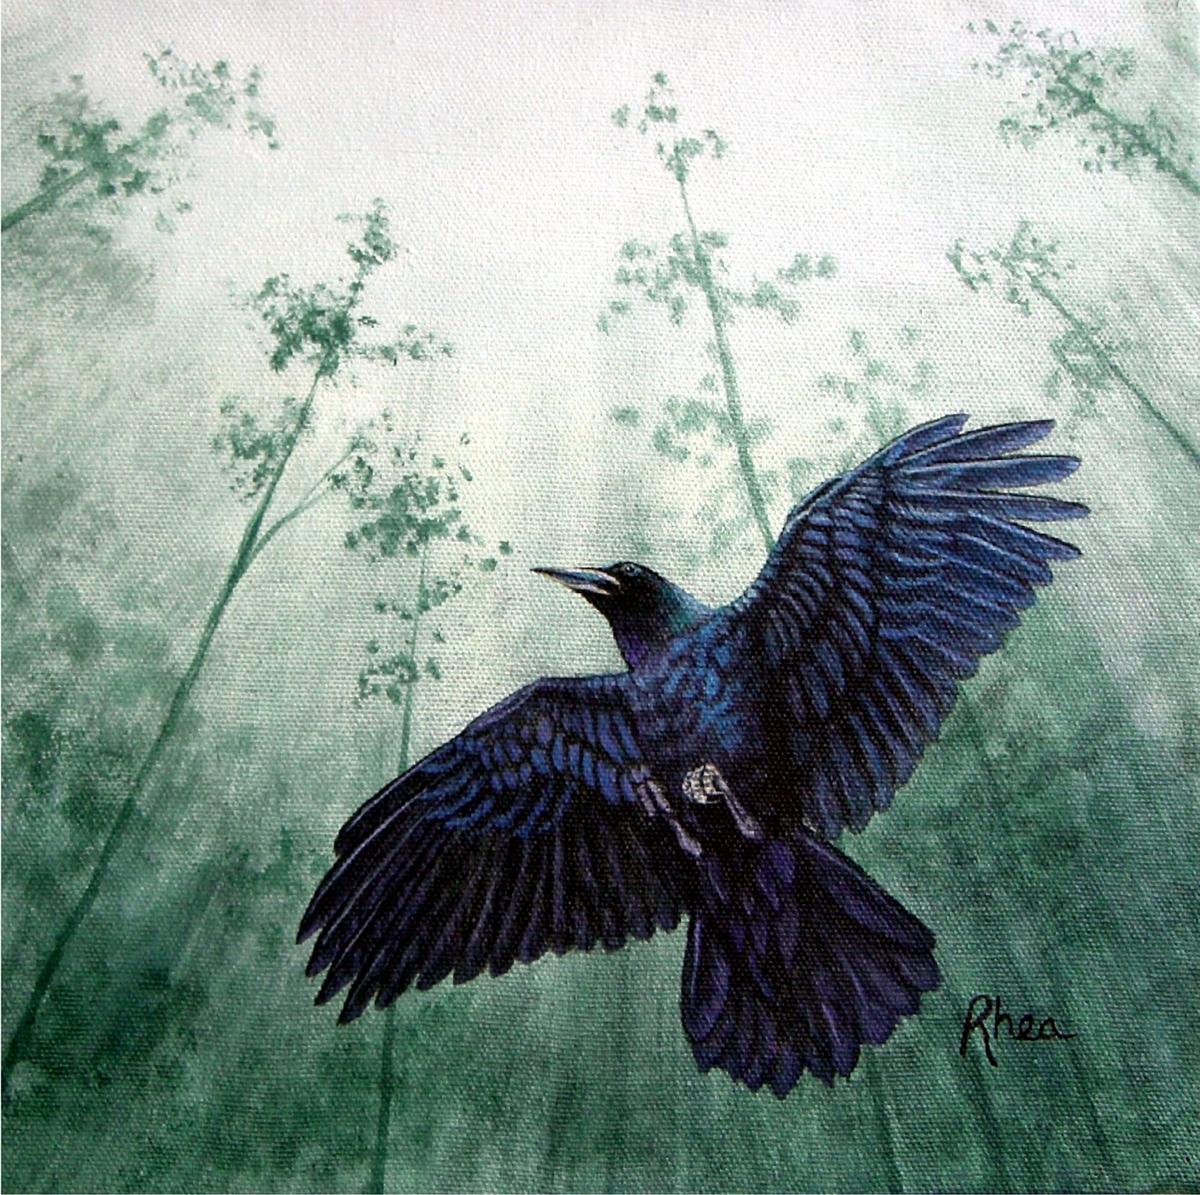 Raven (large view)